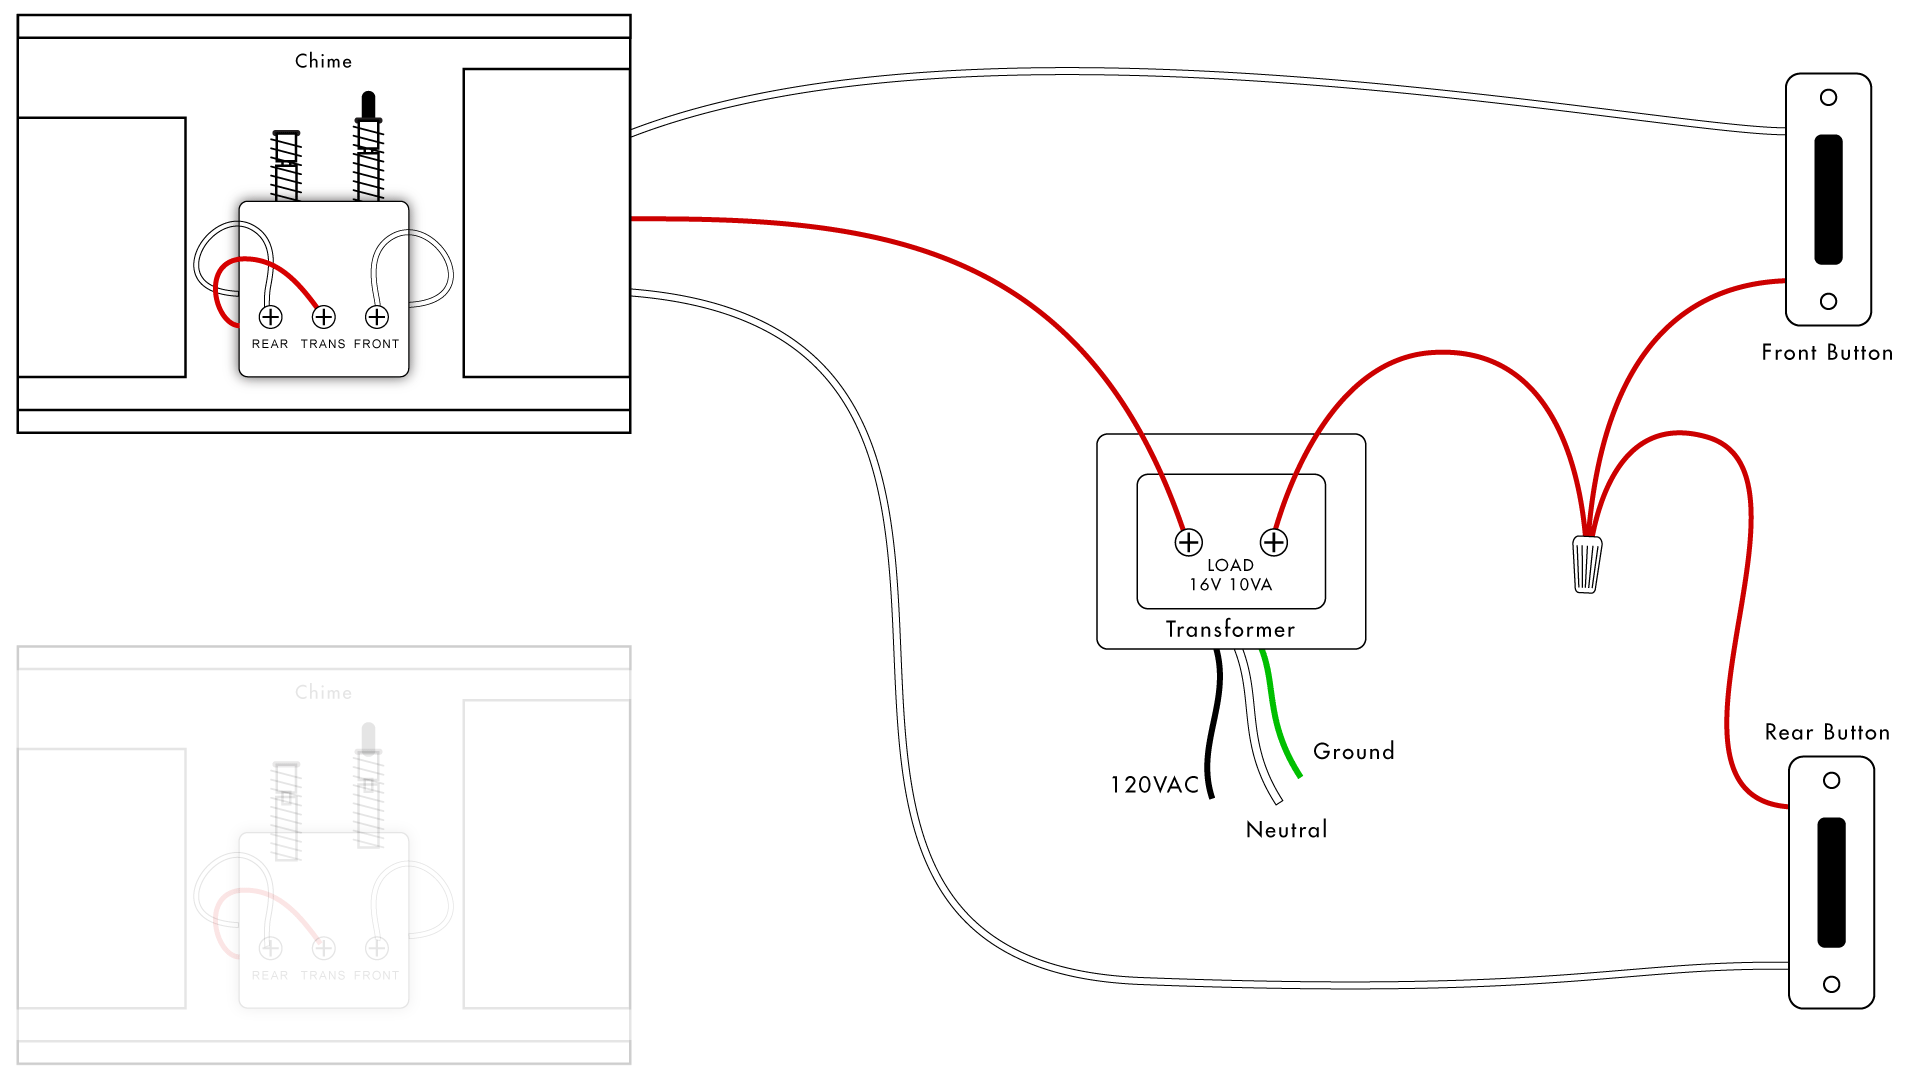 new wiring diagram for bt master socket diagrams digramssample diagramimages wiringdiagramsample wiringdiagram [ 1920 x 1080 Pixel ]